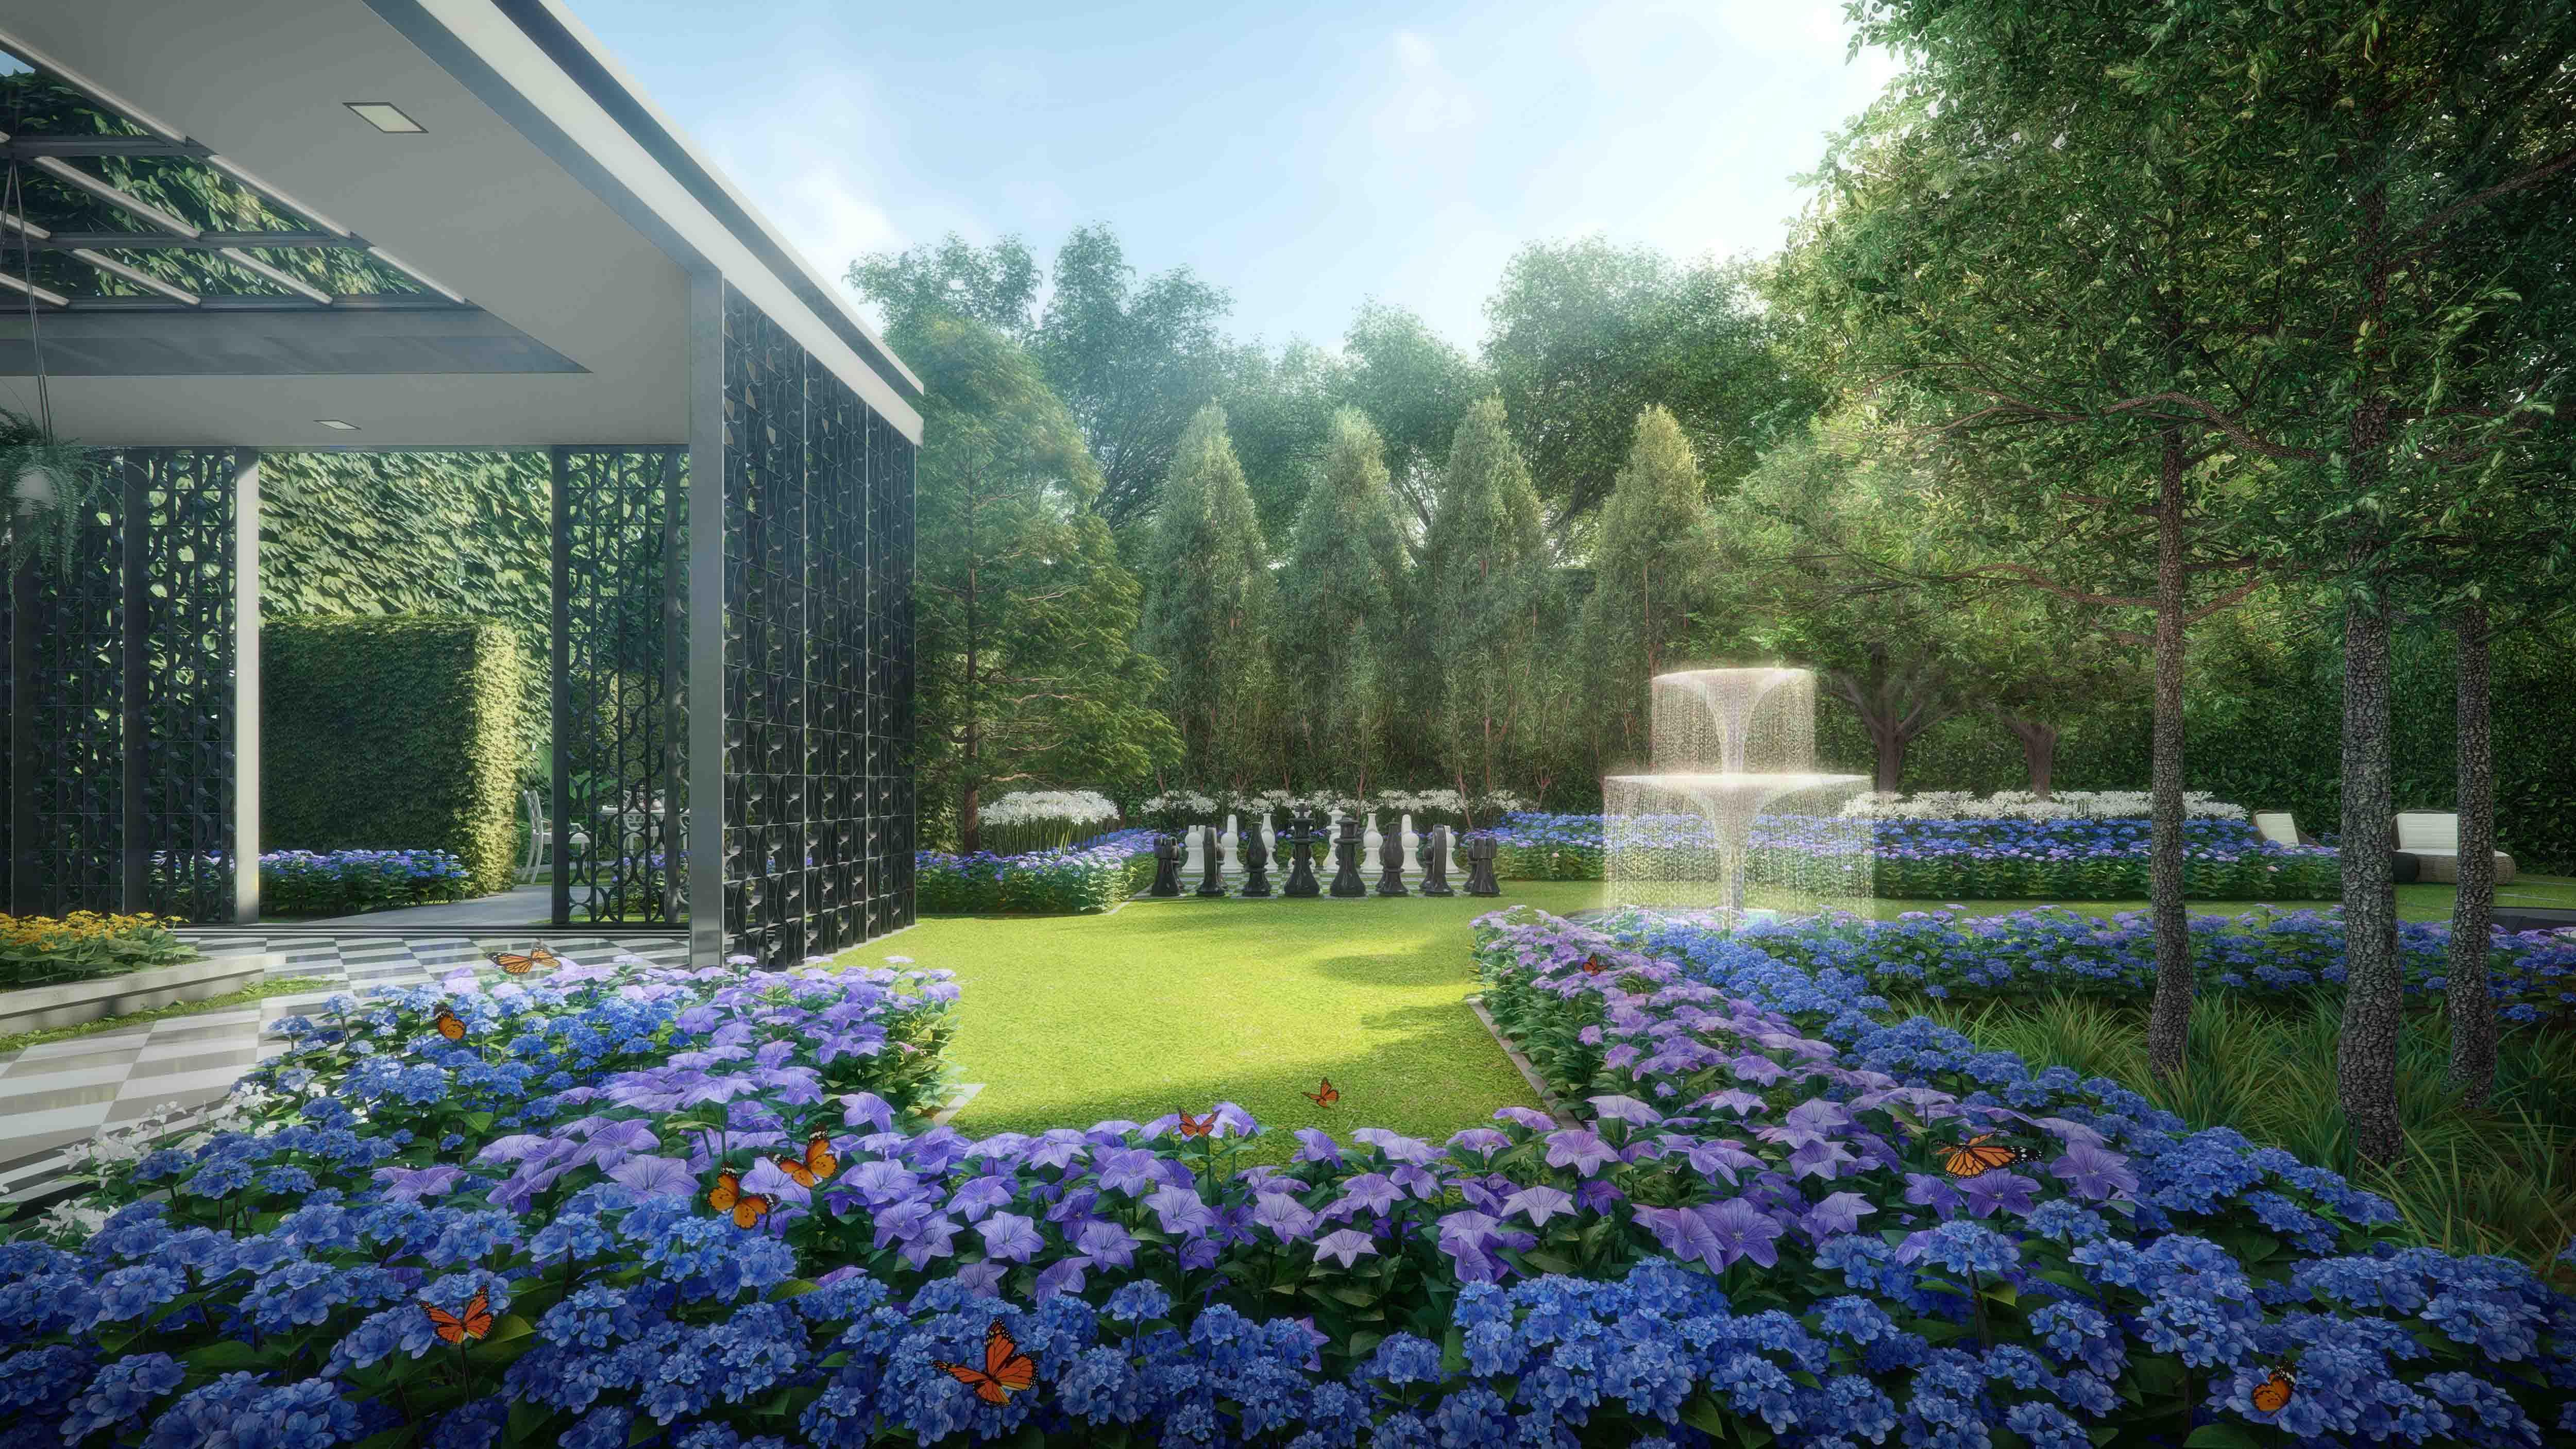 park-colonial-flower-garden